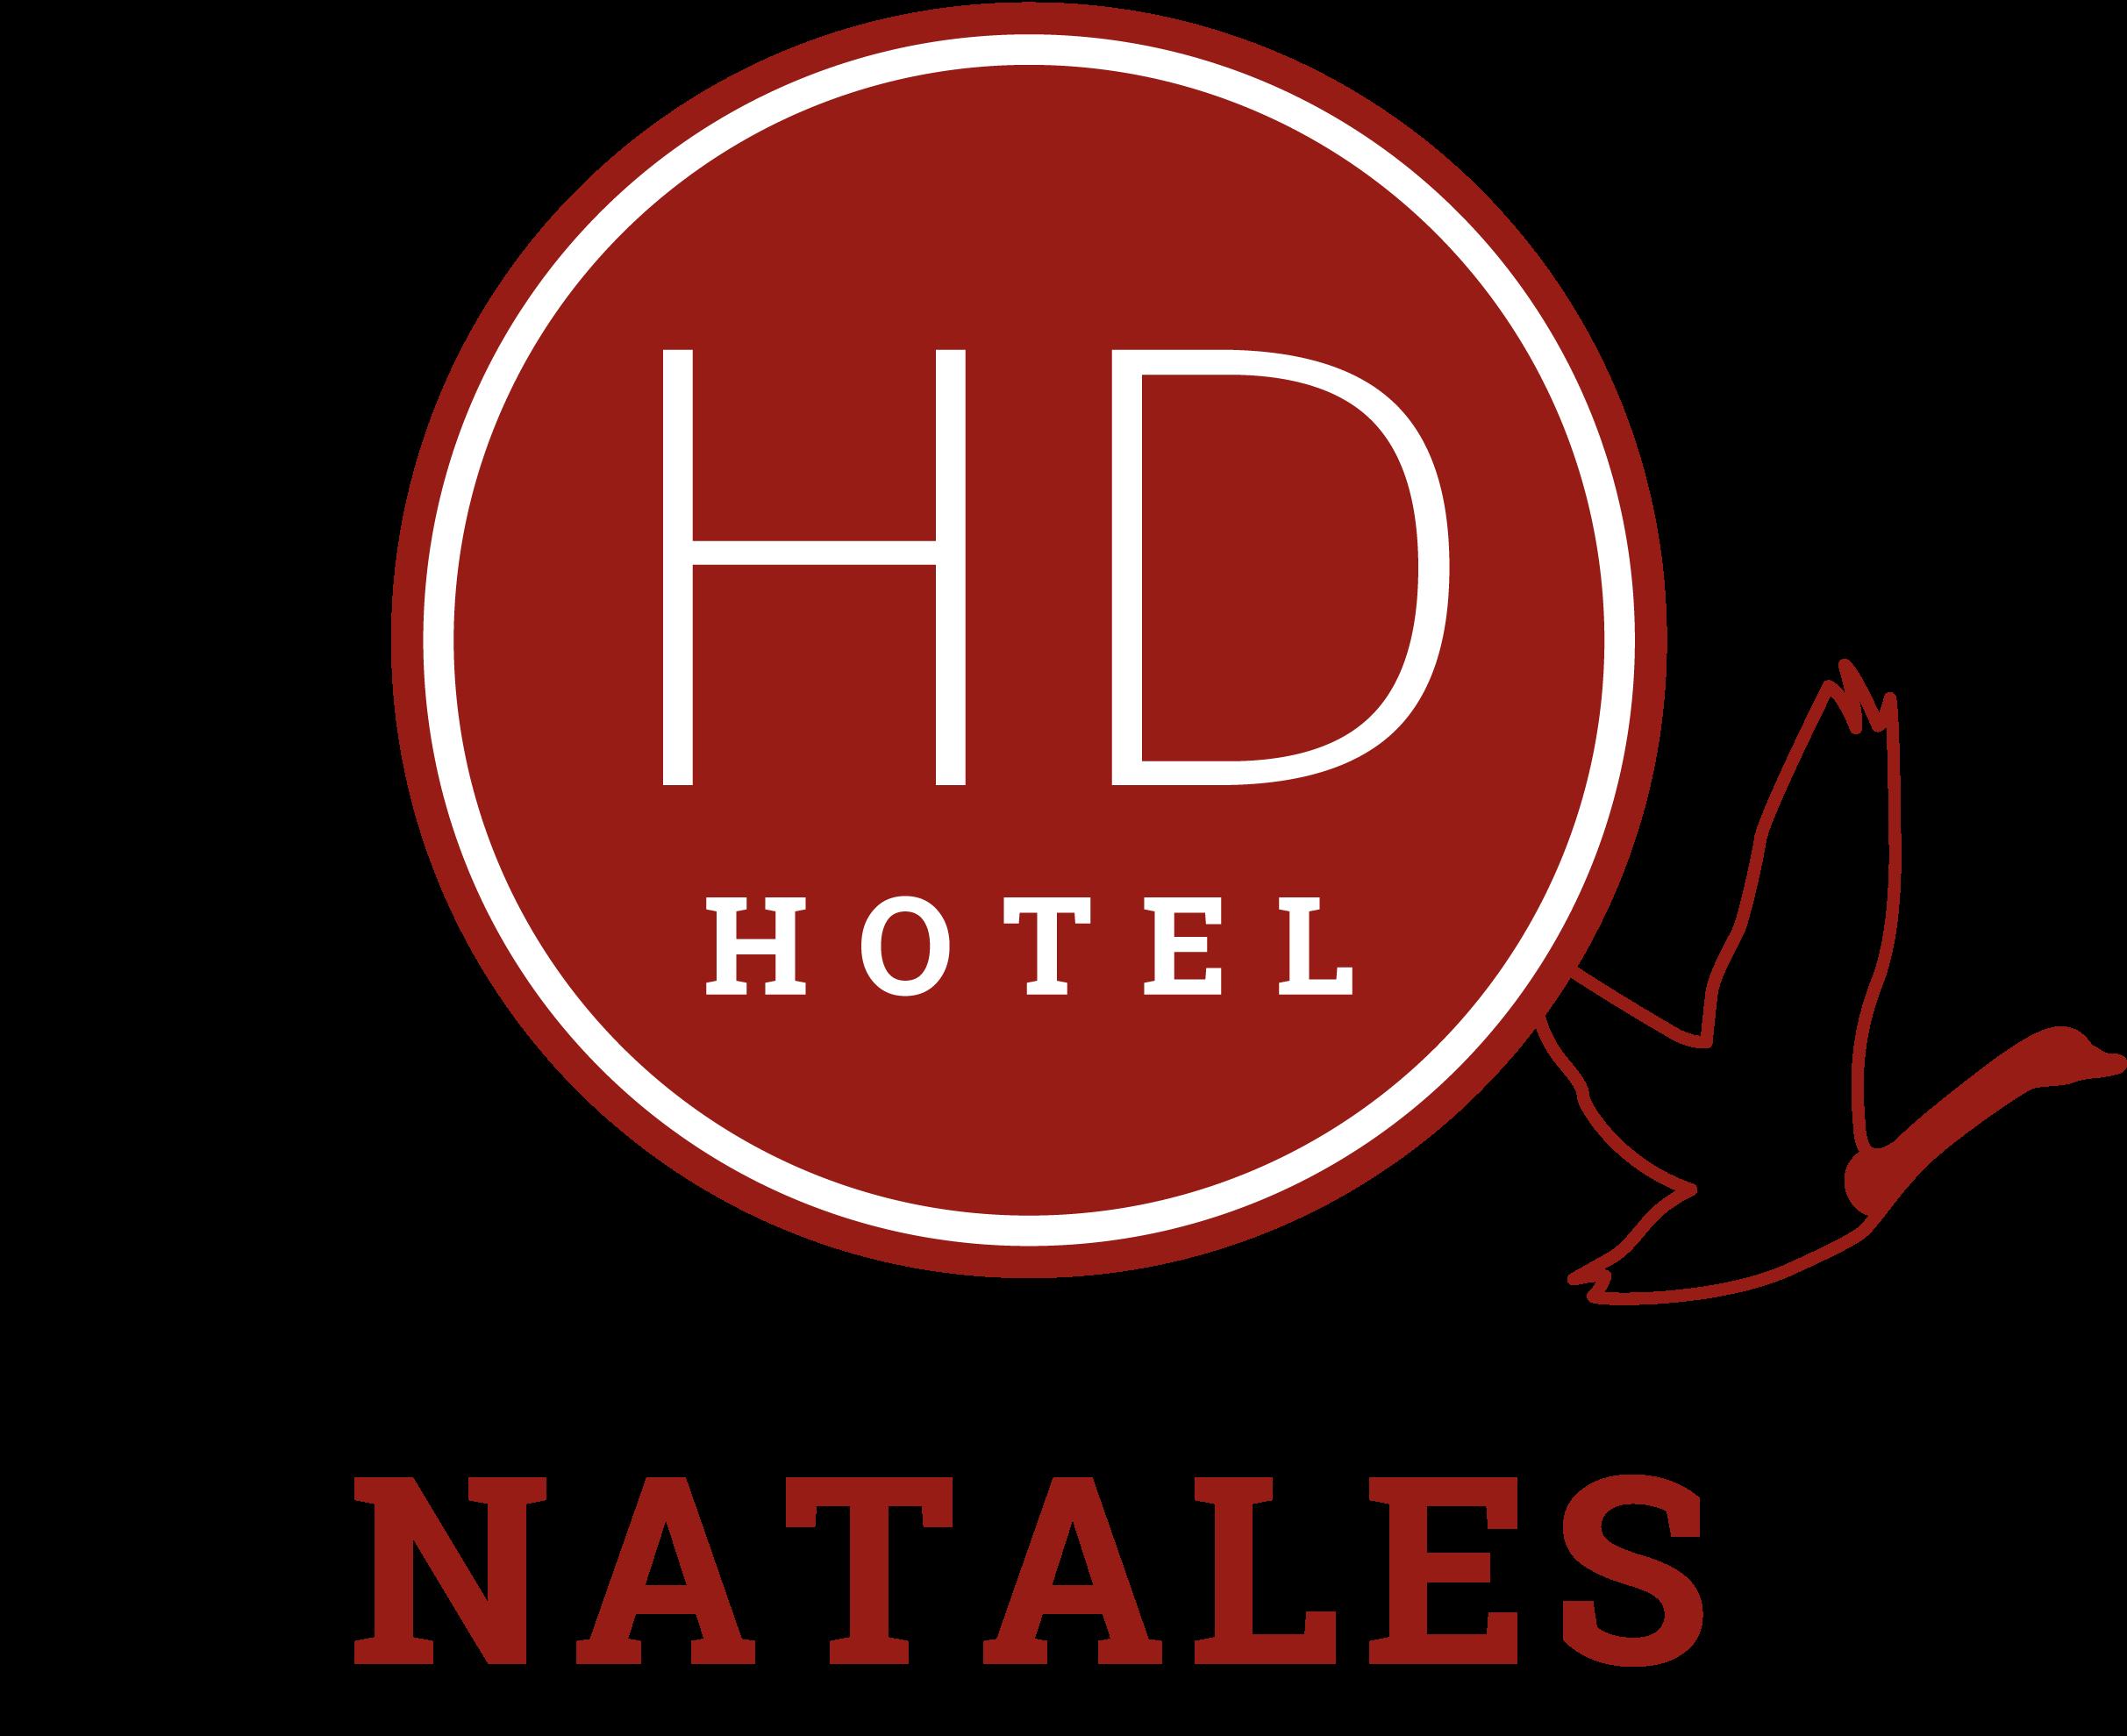 Hotel HD Natales Logo